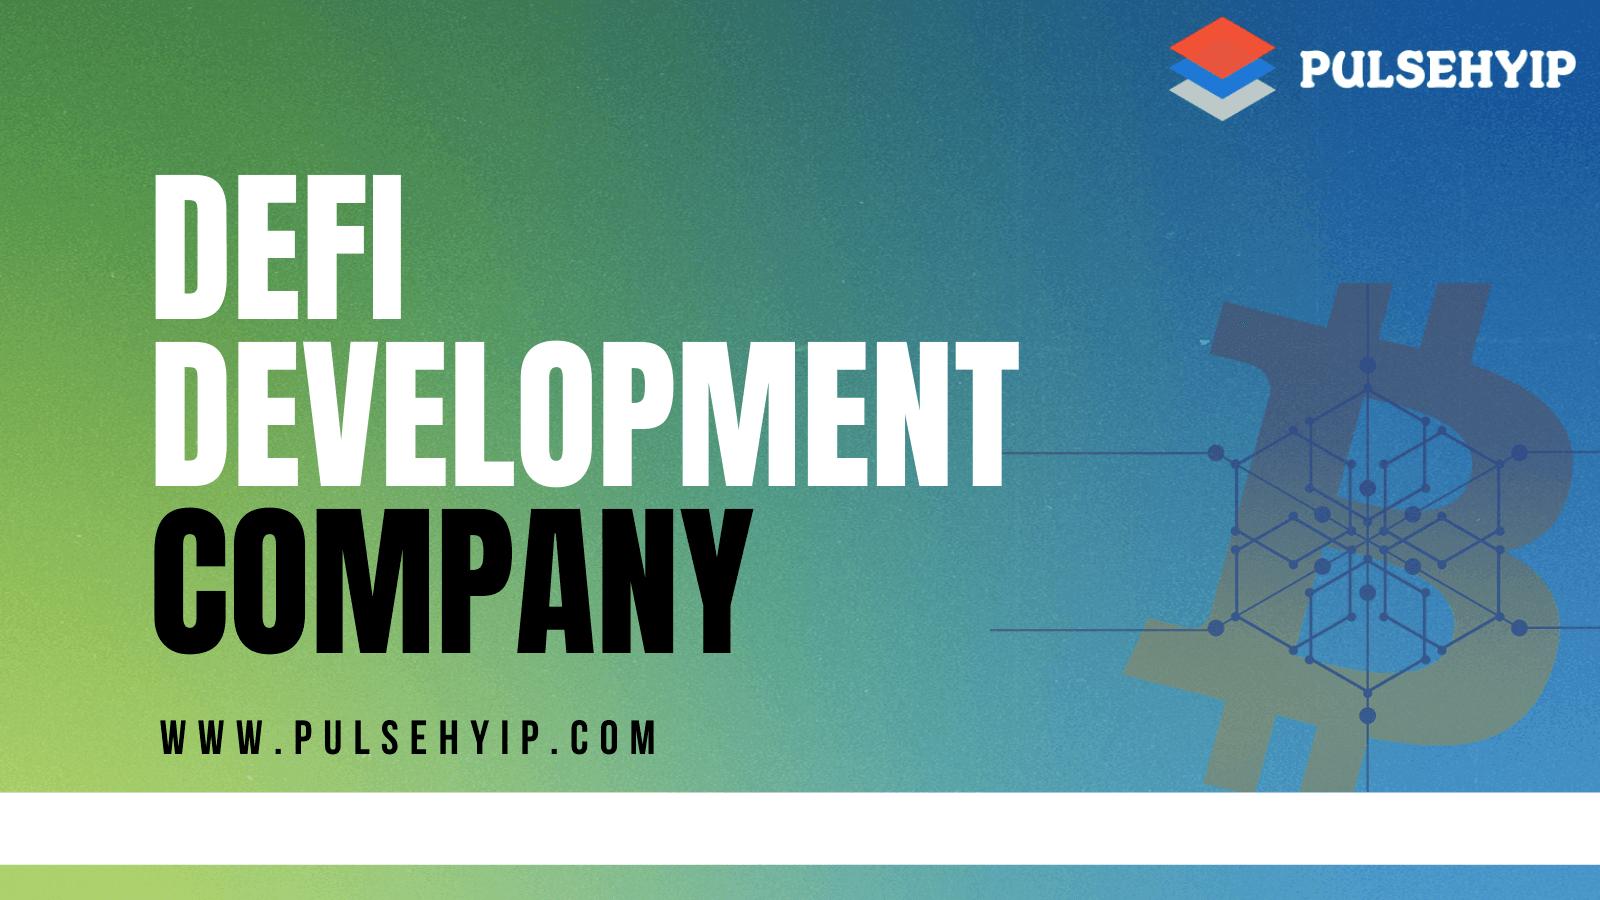 Decentralized Finance (DeFi) Development Company - DeFi Based Protocol Services & Solutions Provider